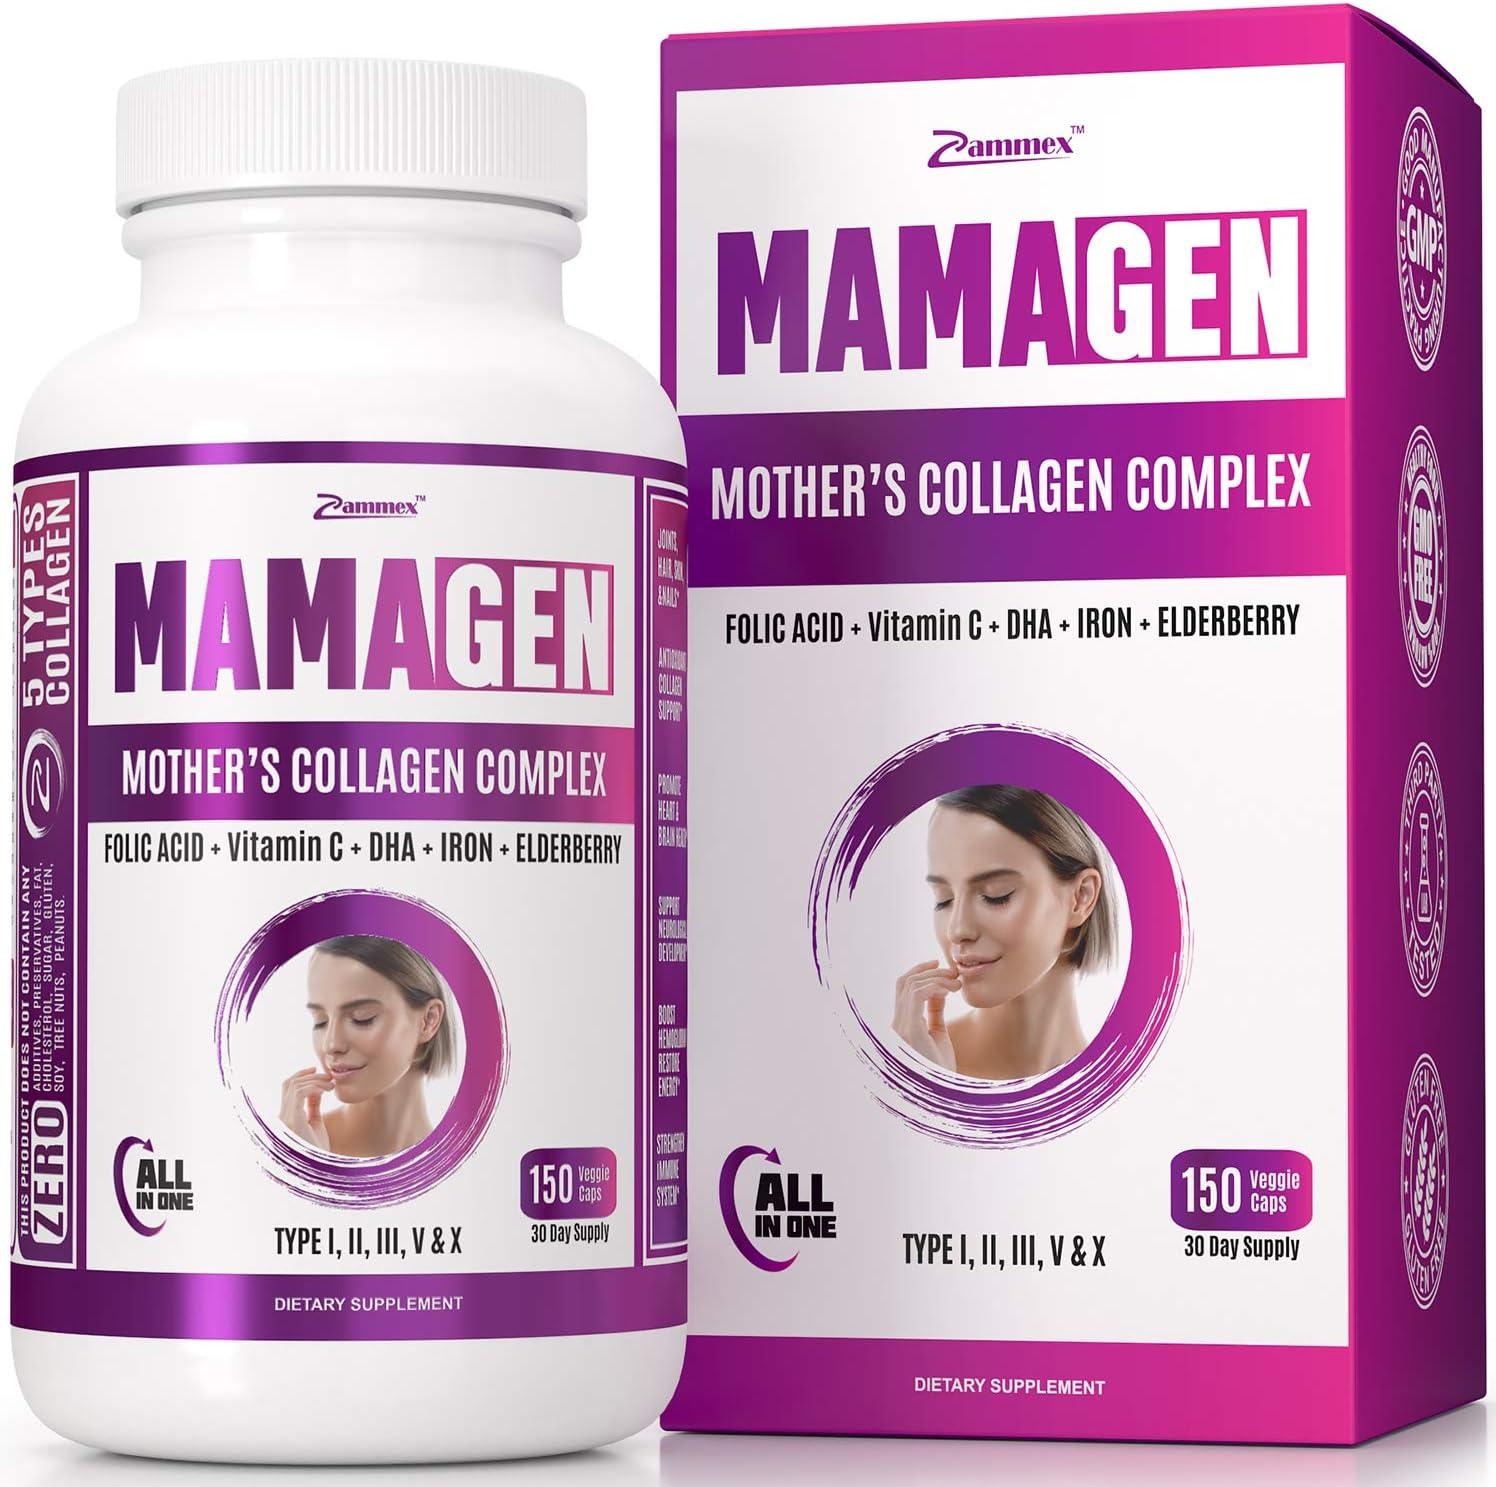 Premium Multi Collagen Peptides for Women (Types I, II, III, V & X) - Folic Acid, DHA, Elderberry, Vitamin C - Prenatal & Postnatal Supplement - Mother's Wellness. Non-GMO, 150 Capsules